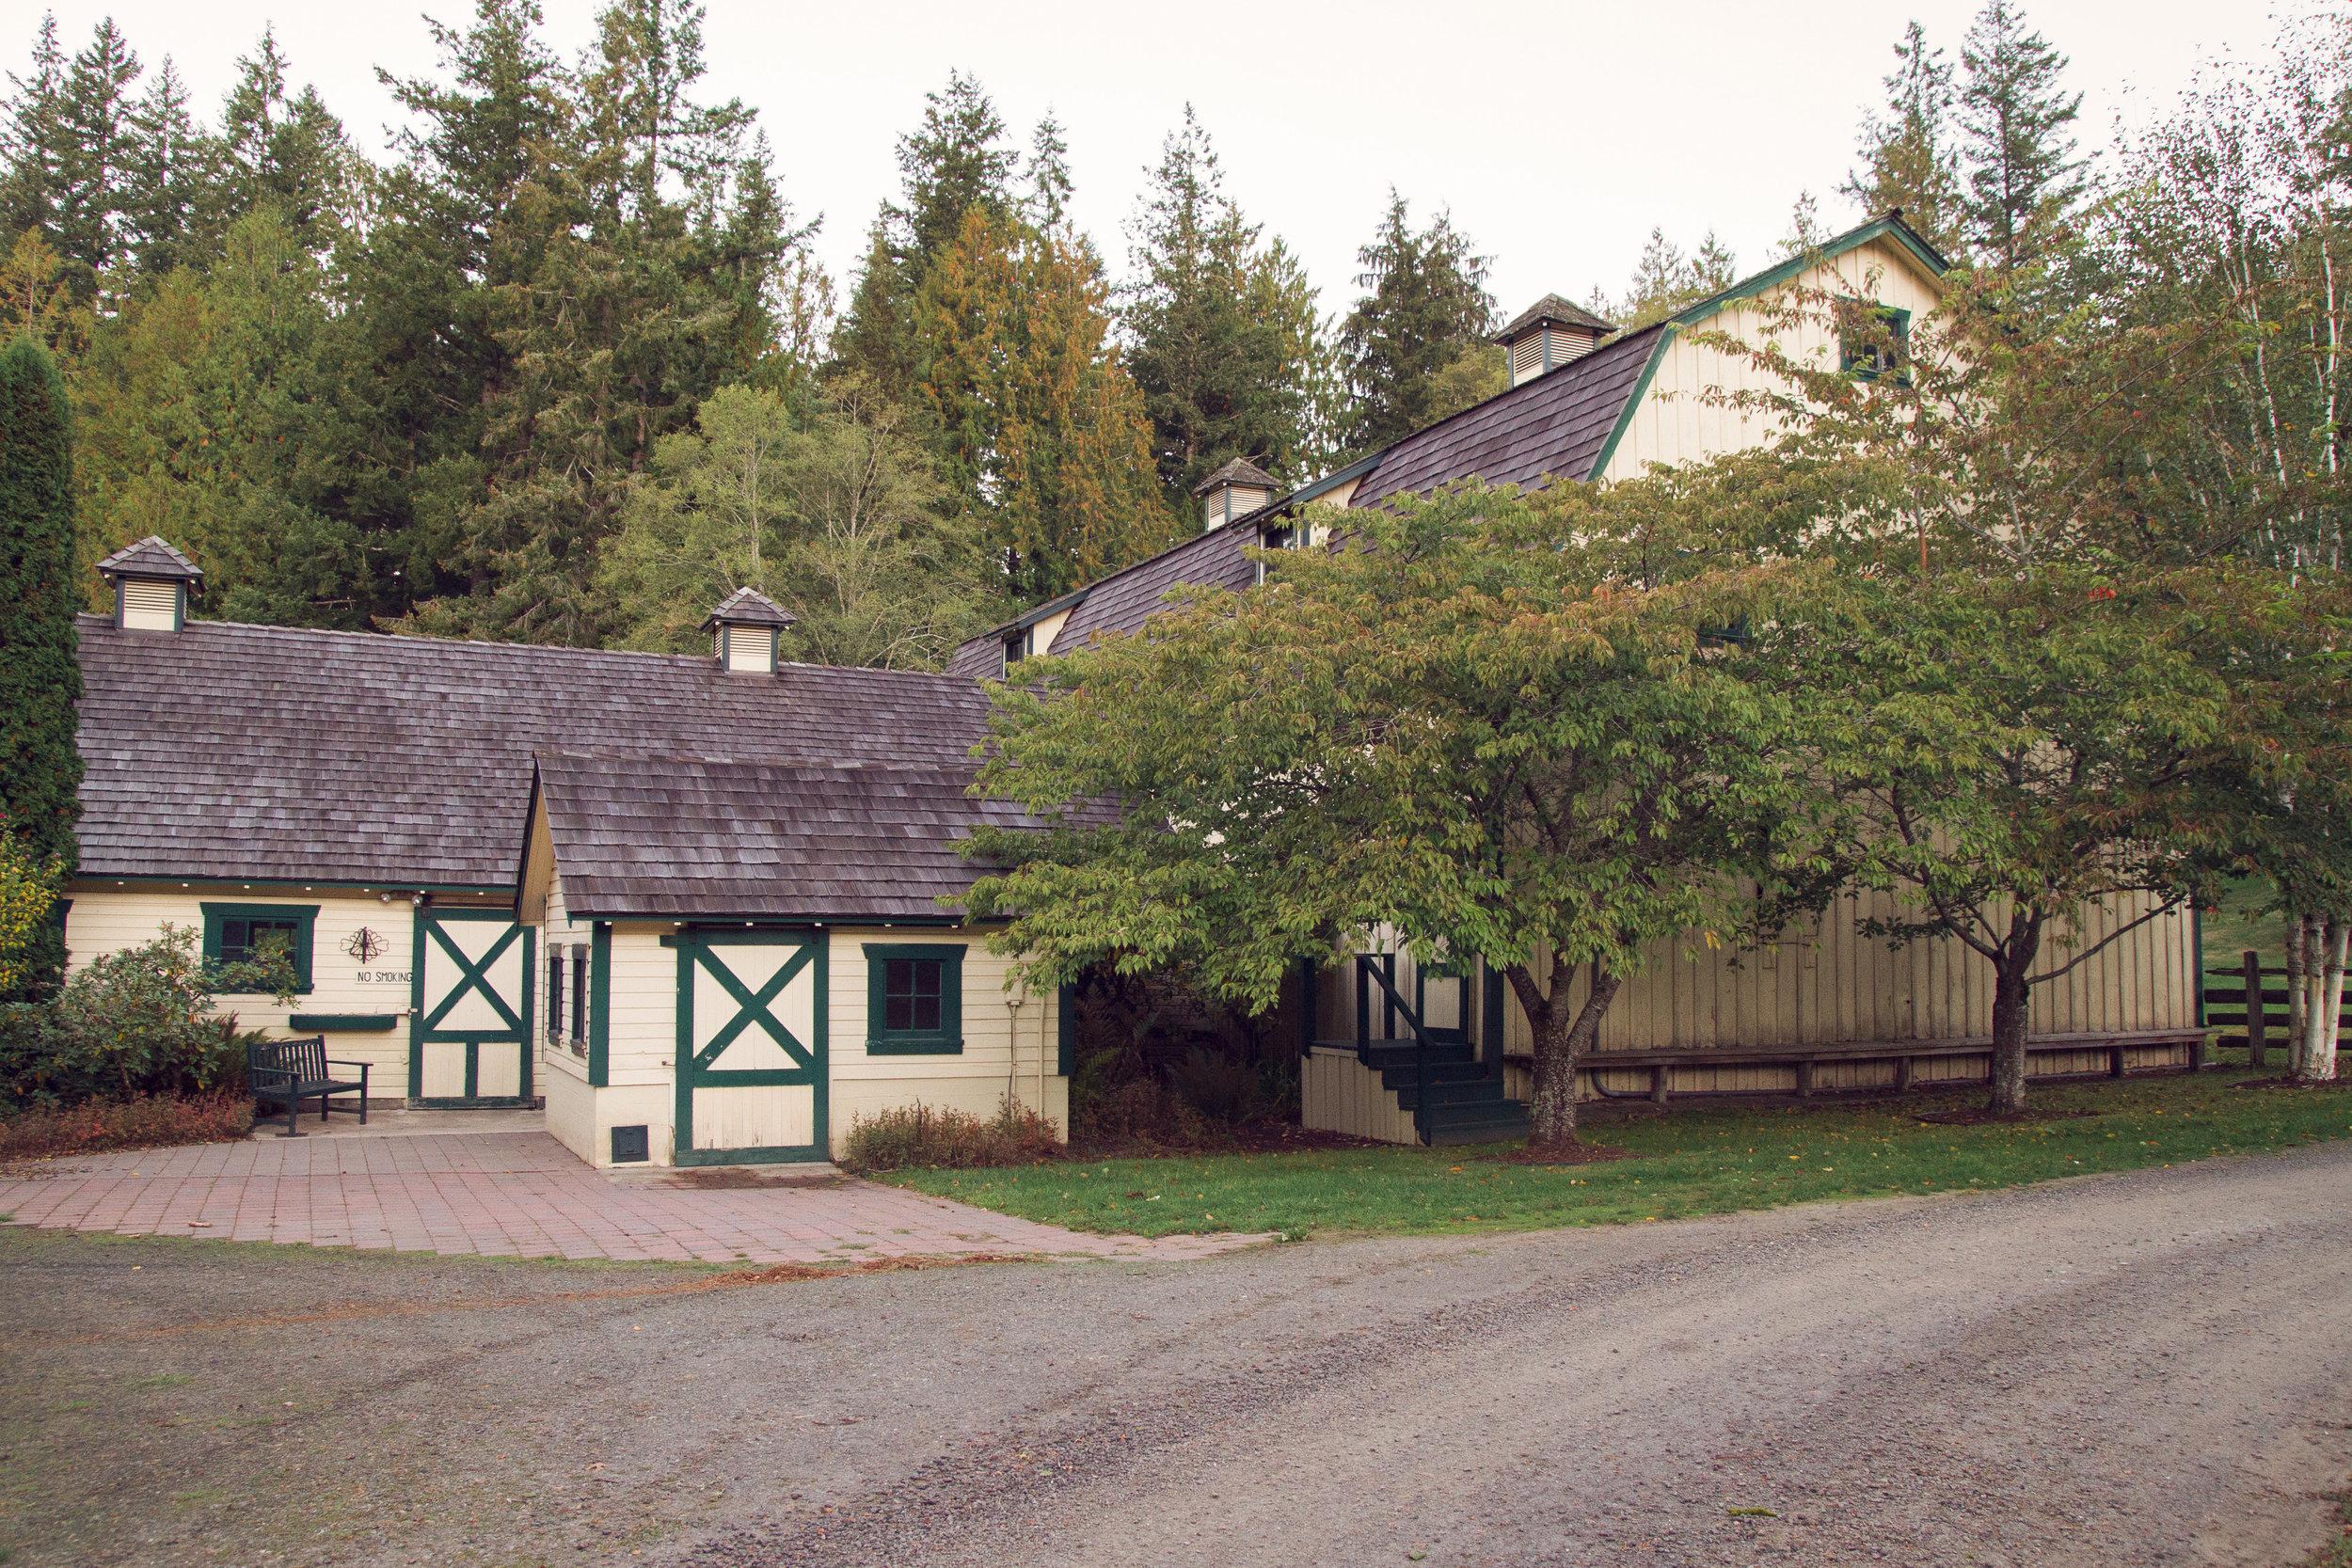 The Barn-0017.jpg